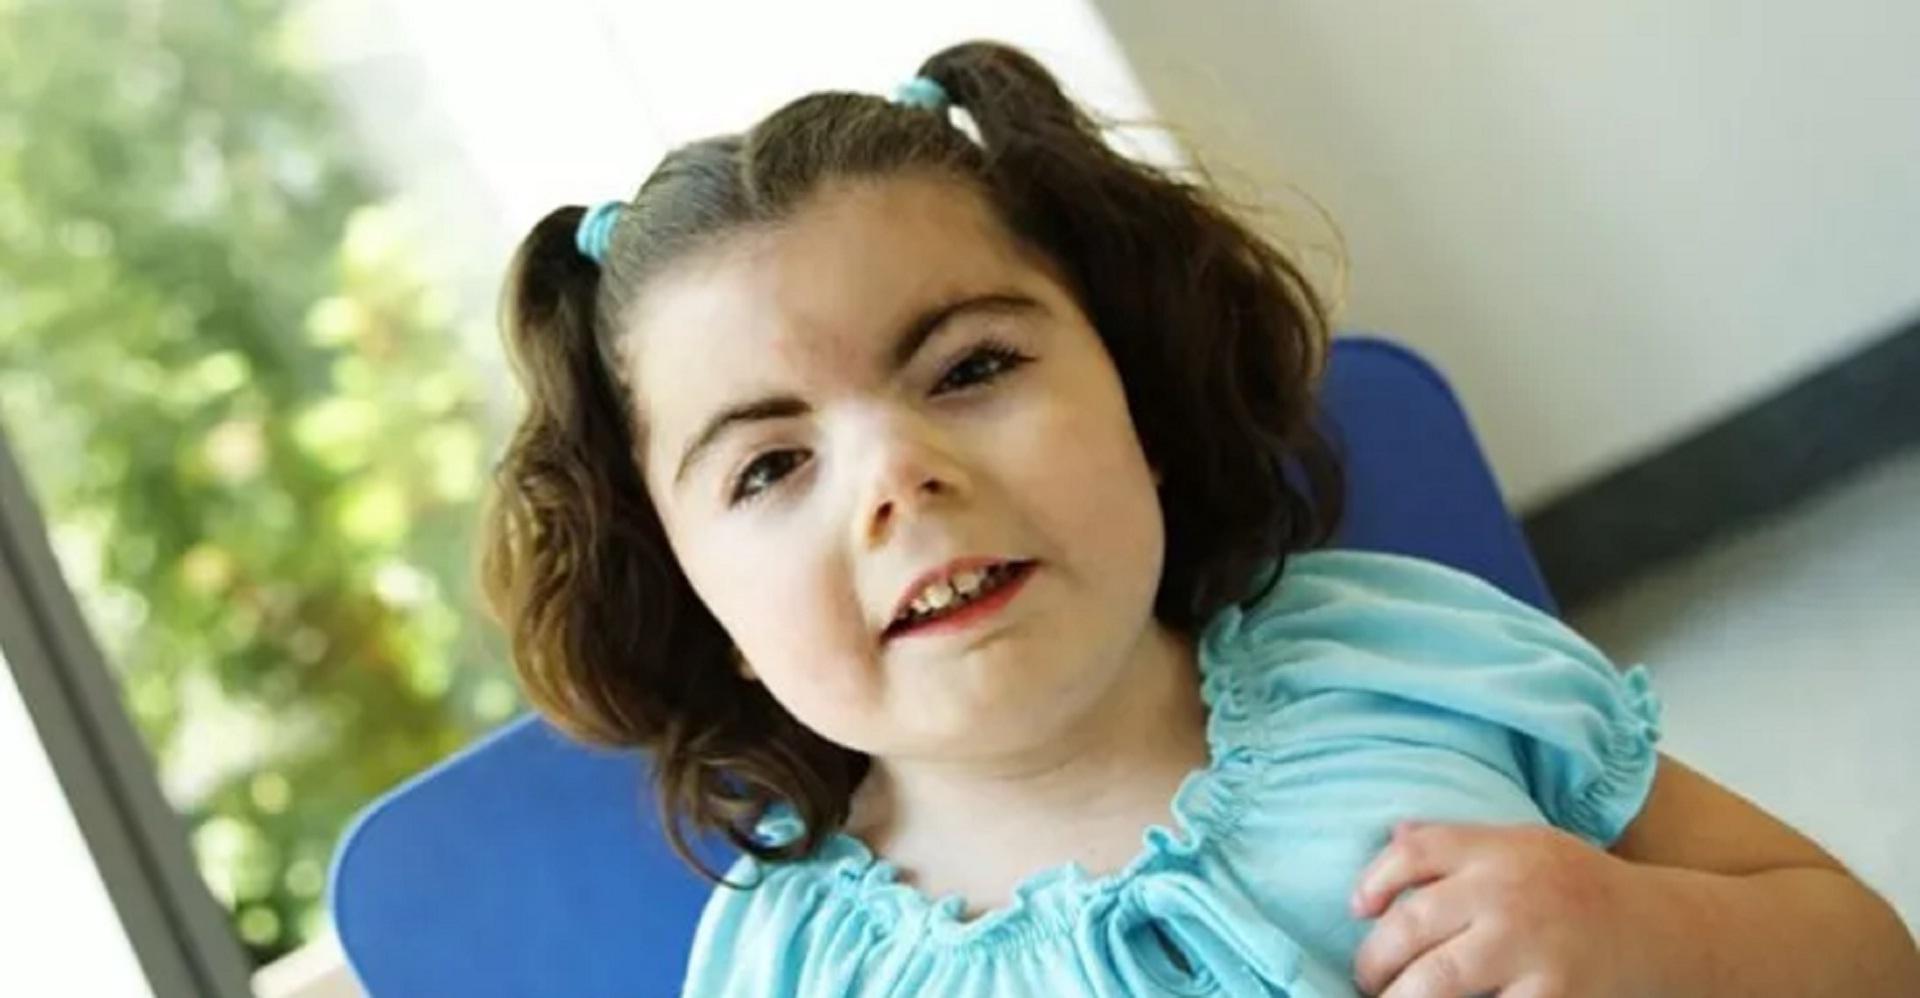 Síndrome Cornelia de Lange: conheça esta síndrome